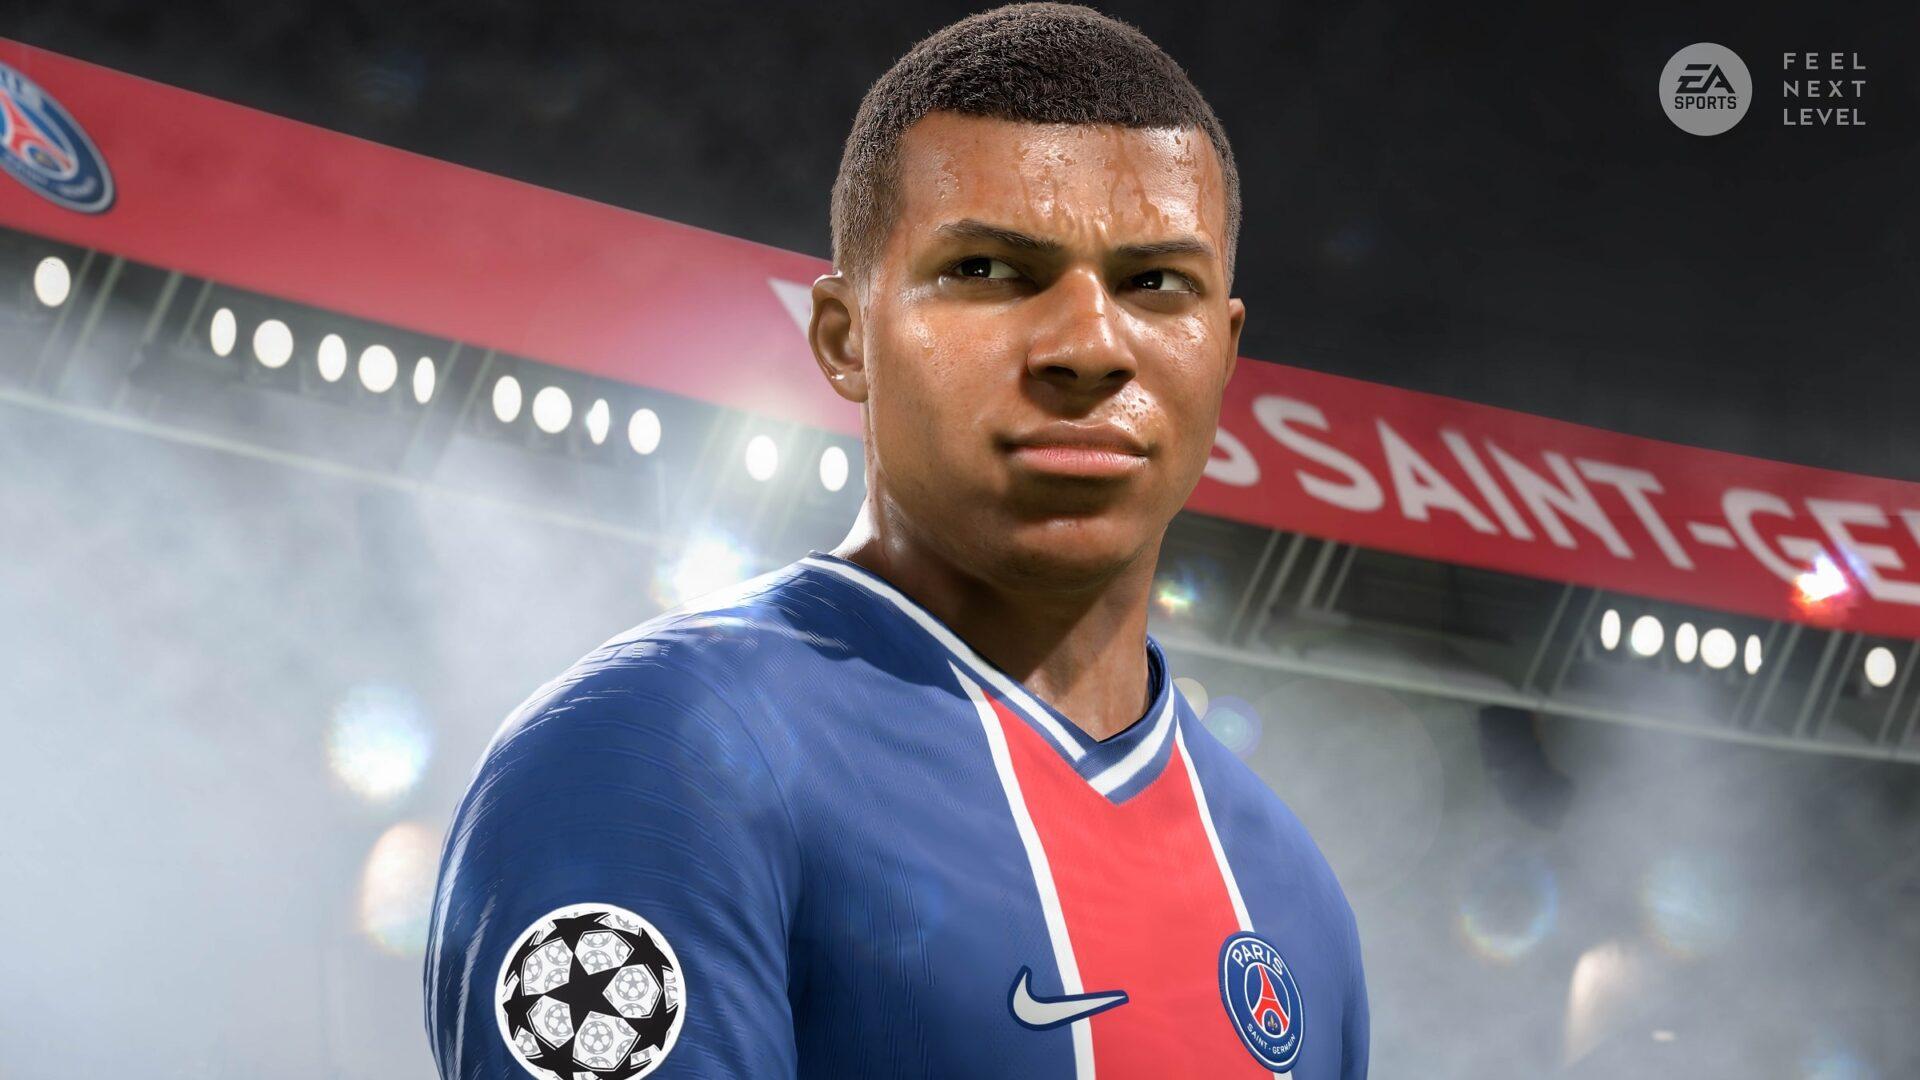 FIFA 22 shush celebration